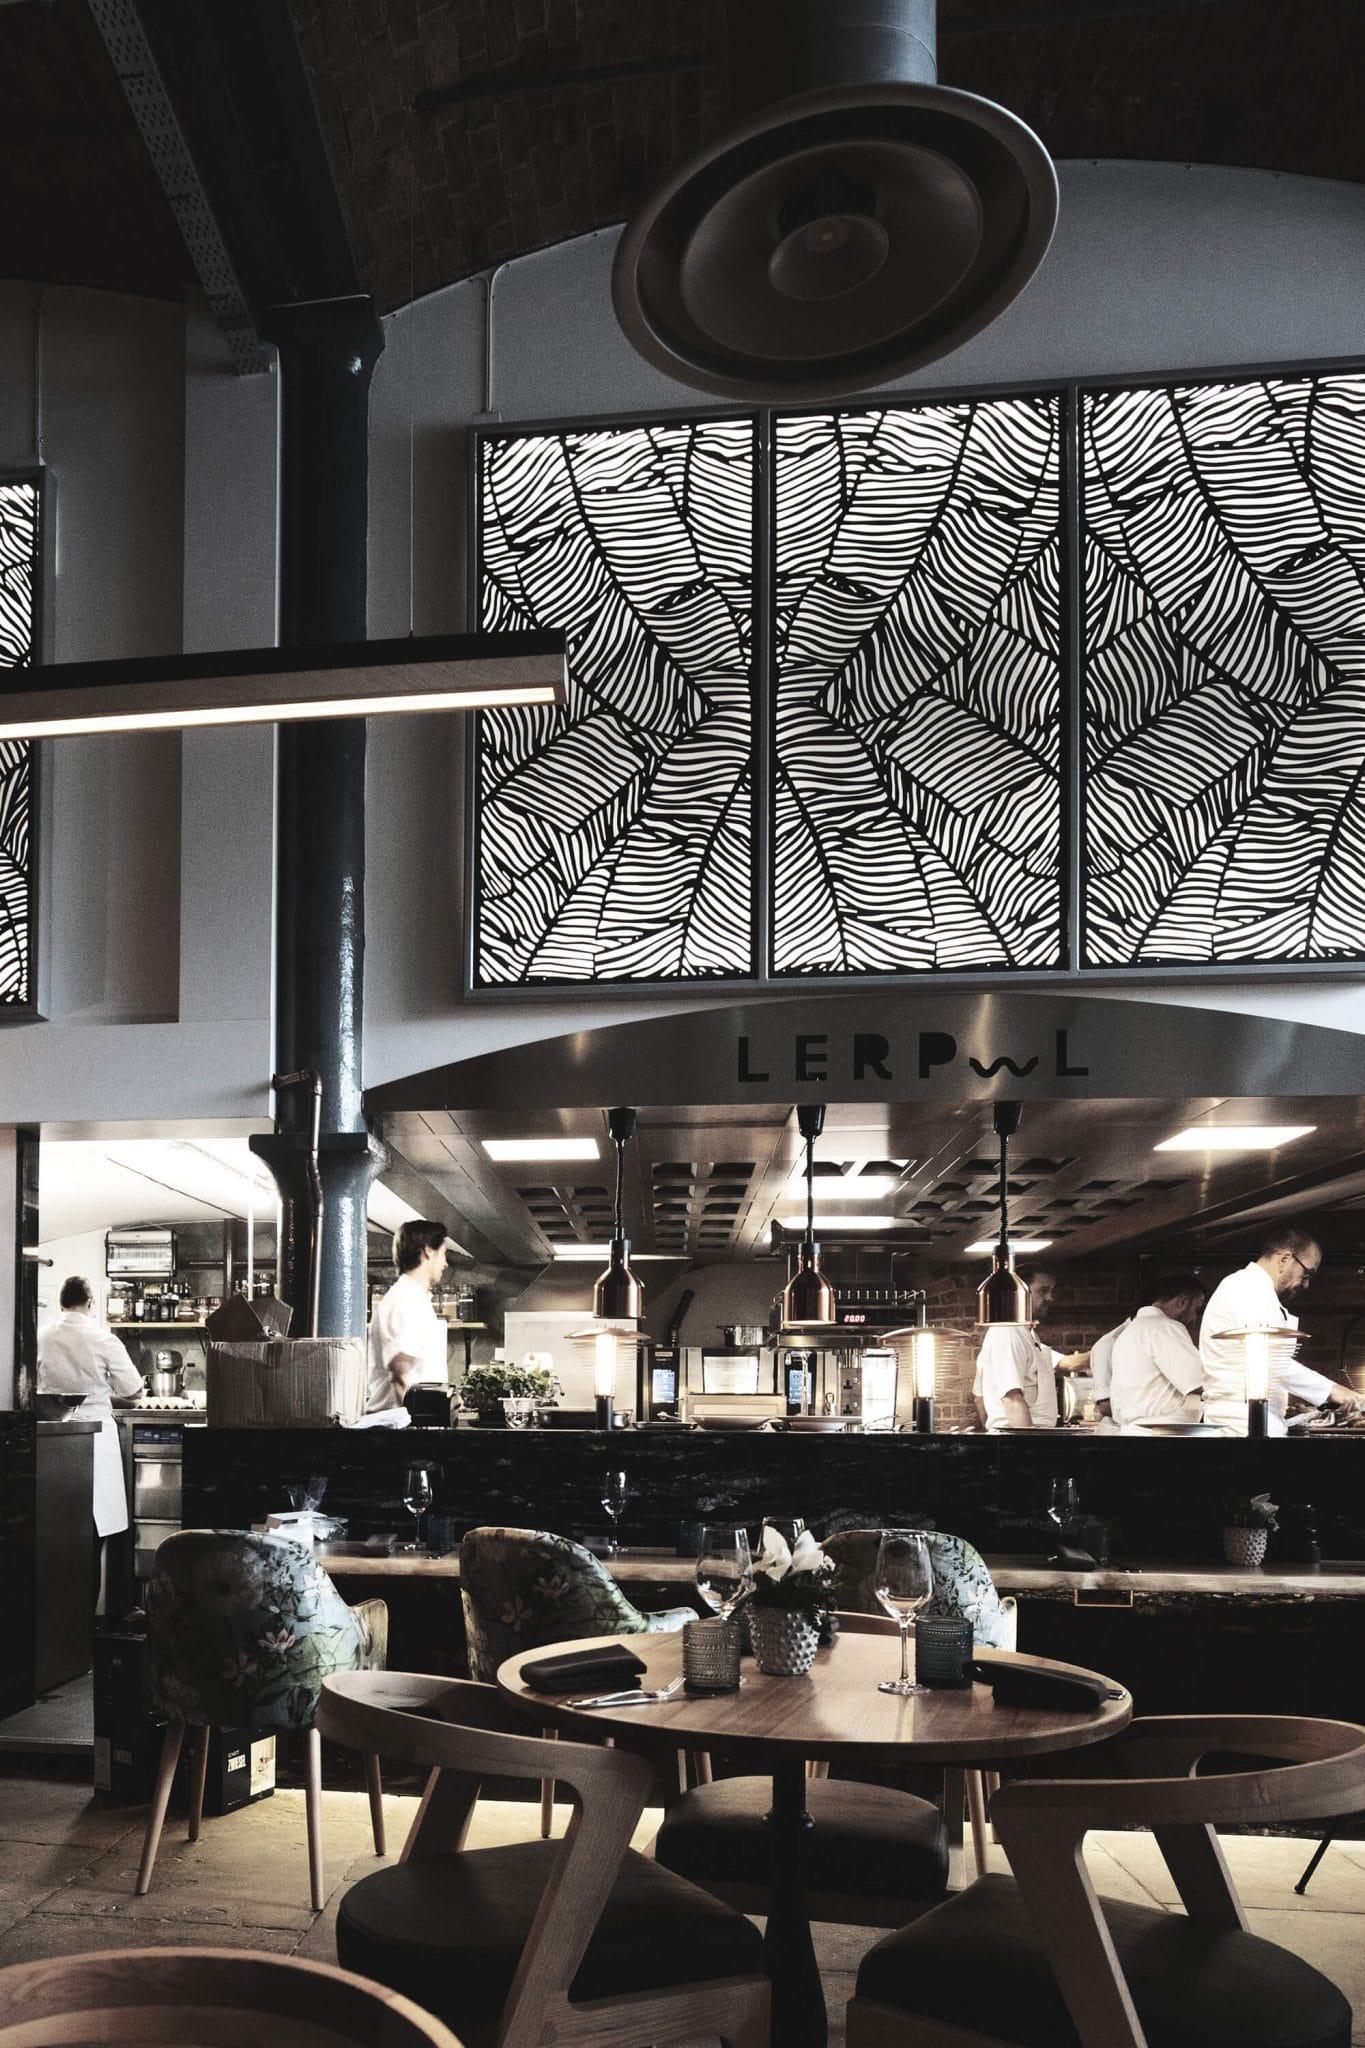 lerpwl restaurant liverpool interior